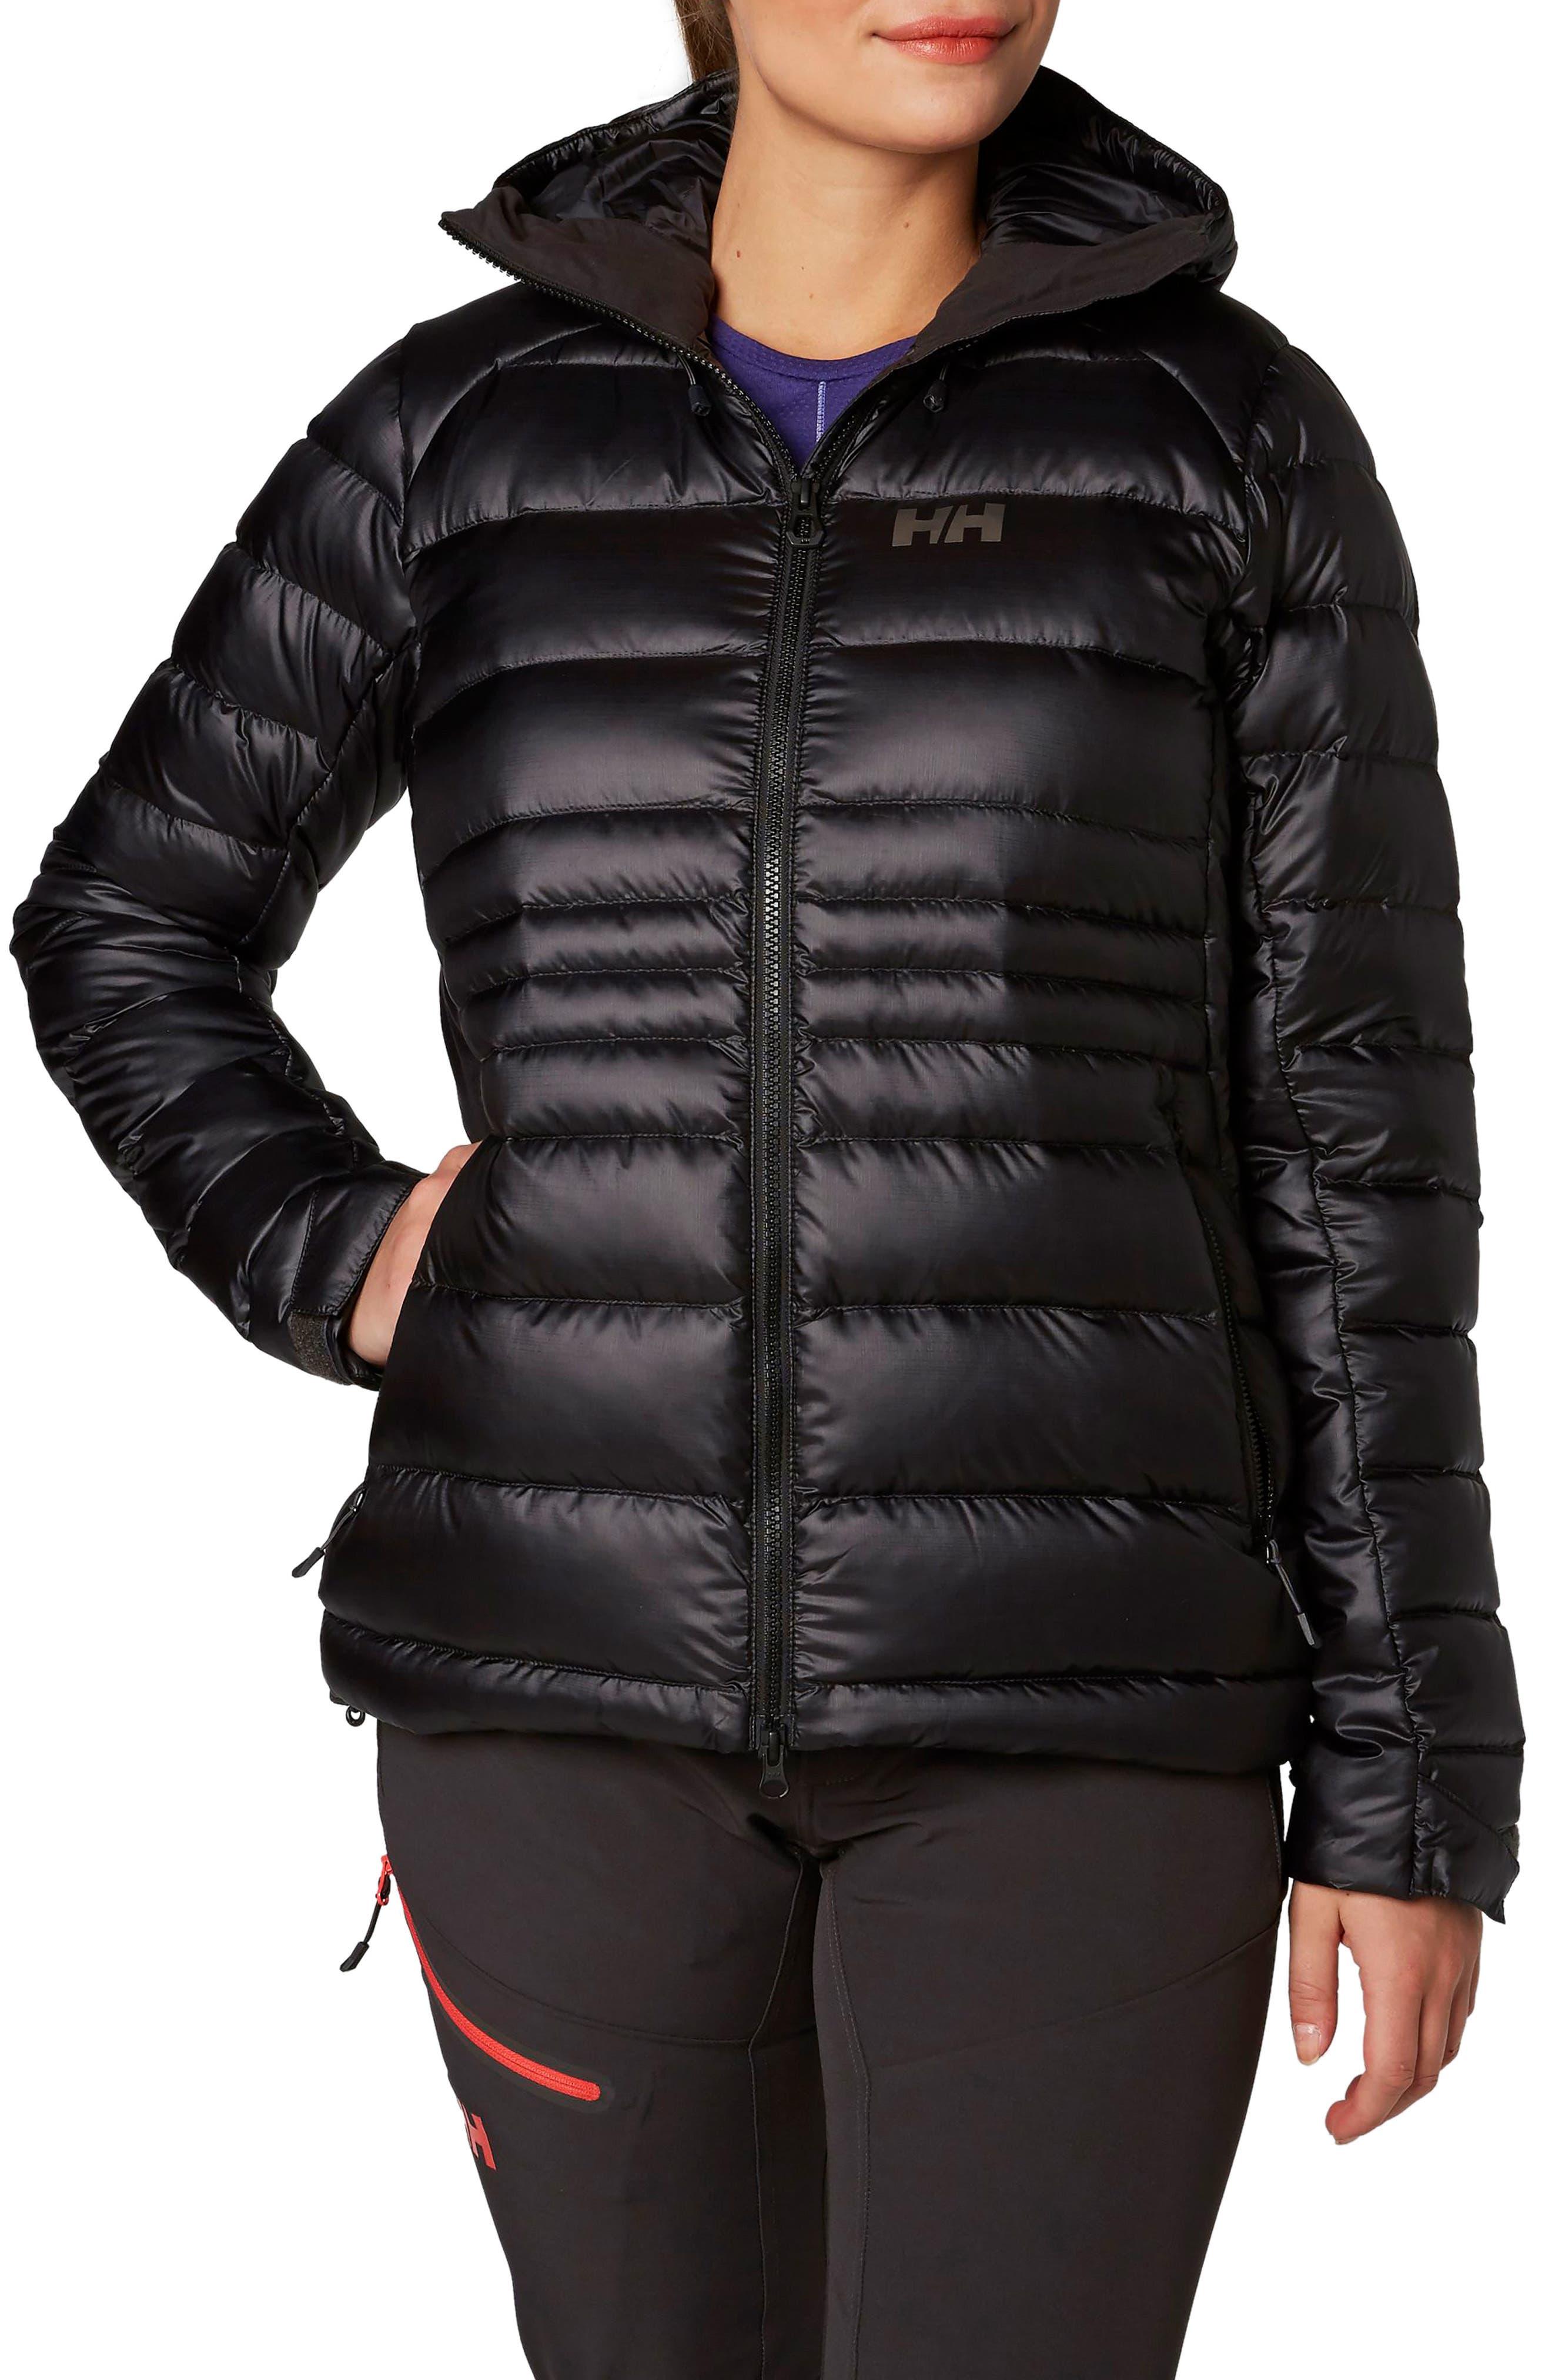 Vanir Icefall Down Jacket,                         Main,                         color, Black